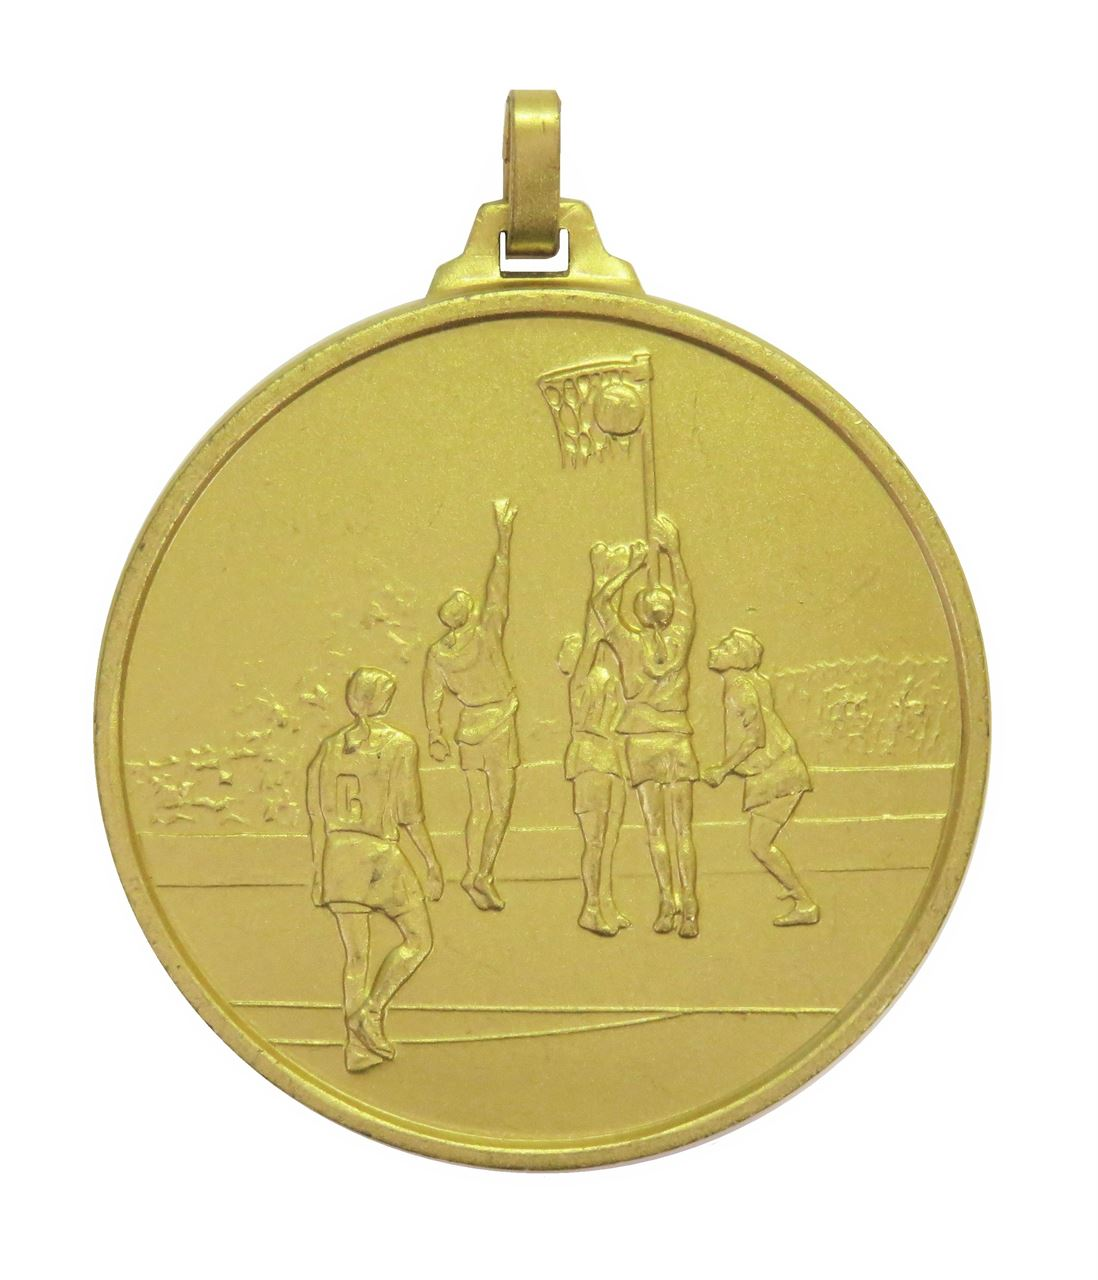 Gold Economy Netball Medal (size: 52mm) - 899E